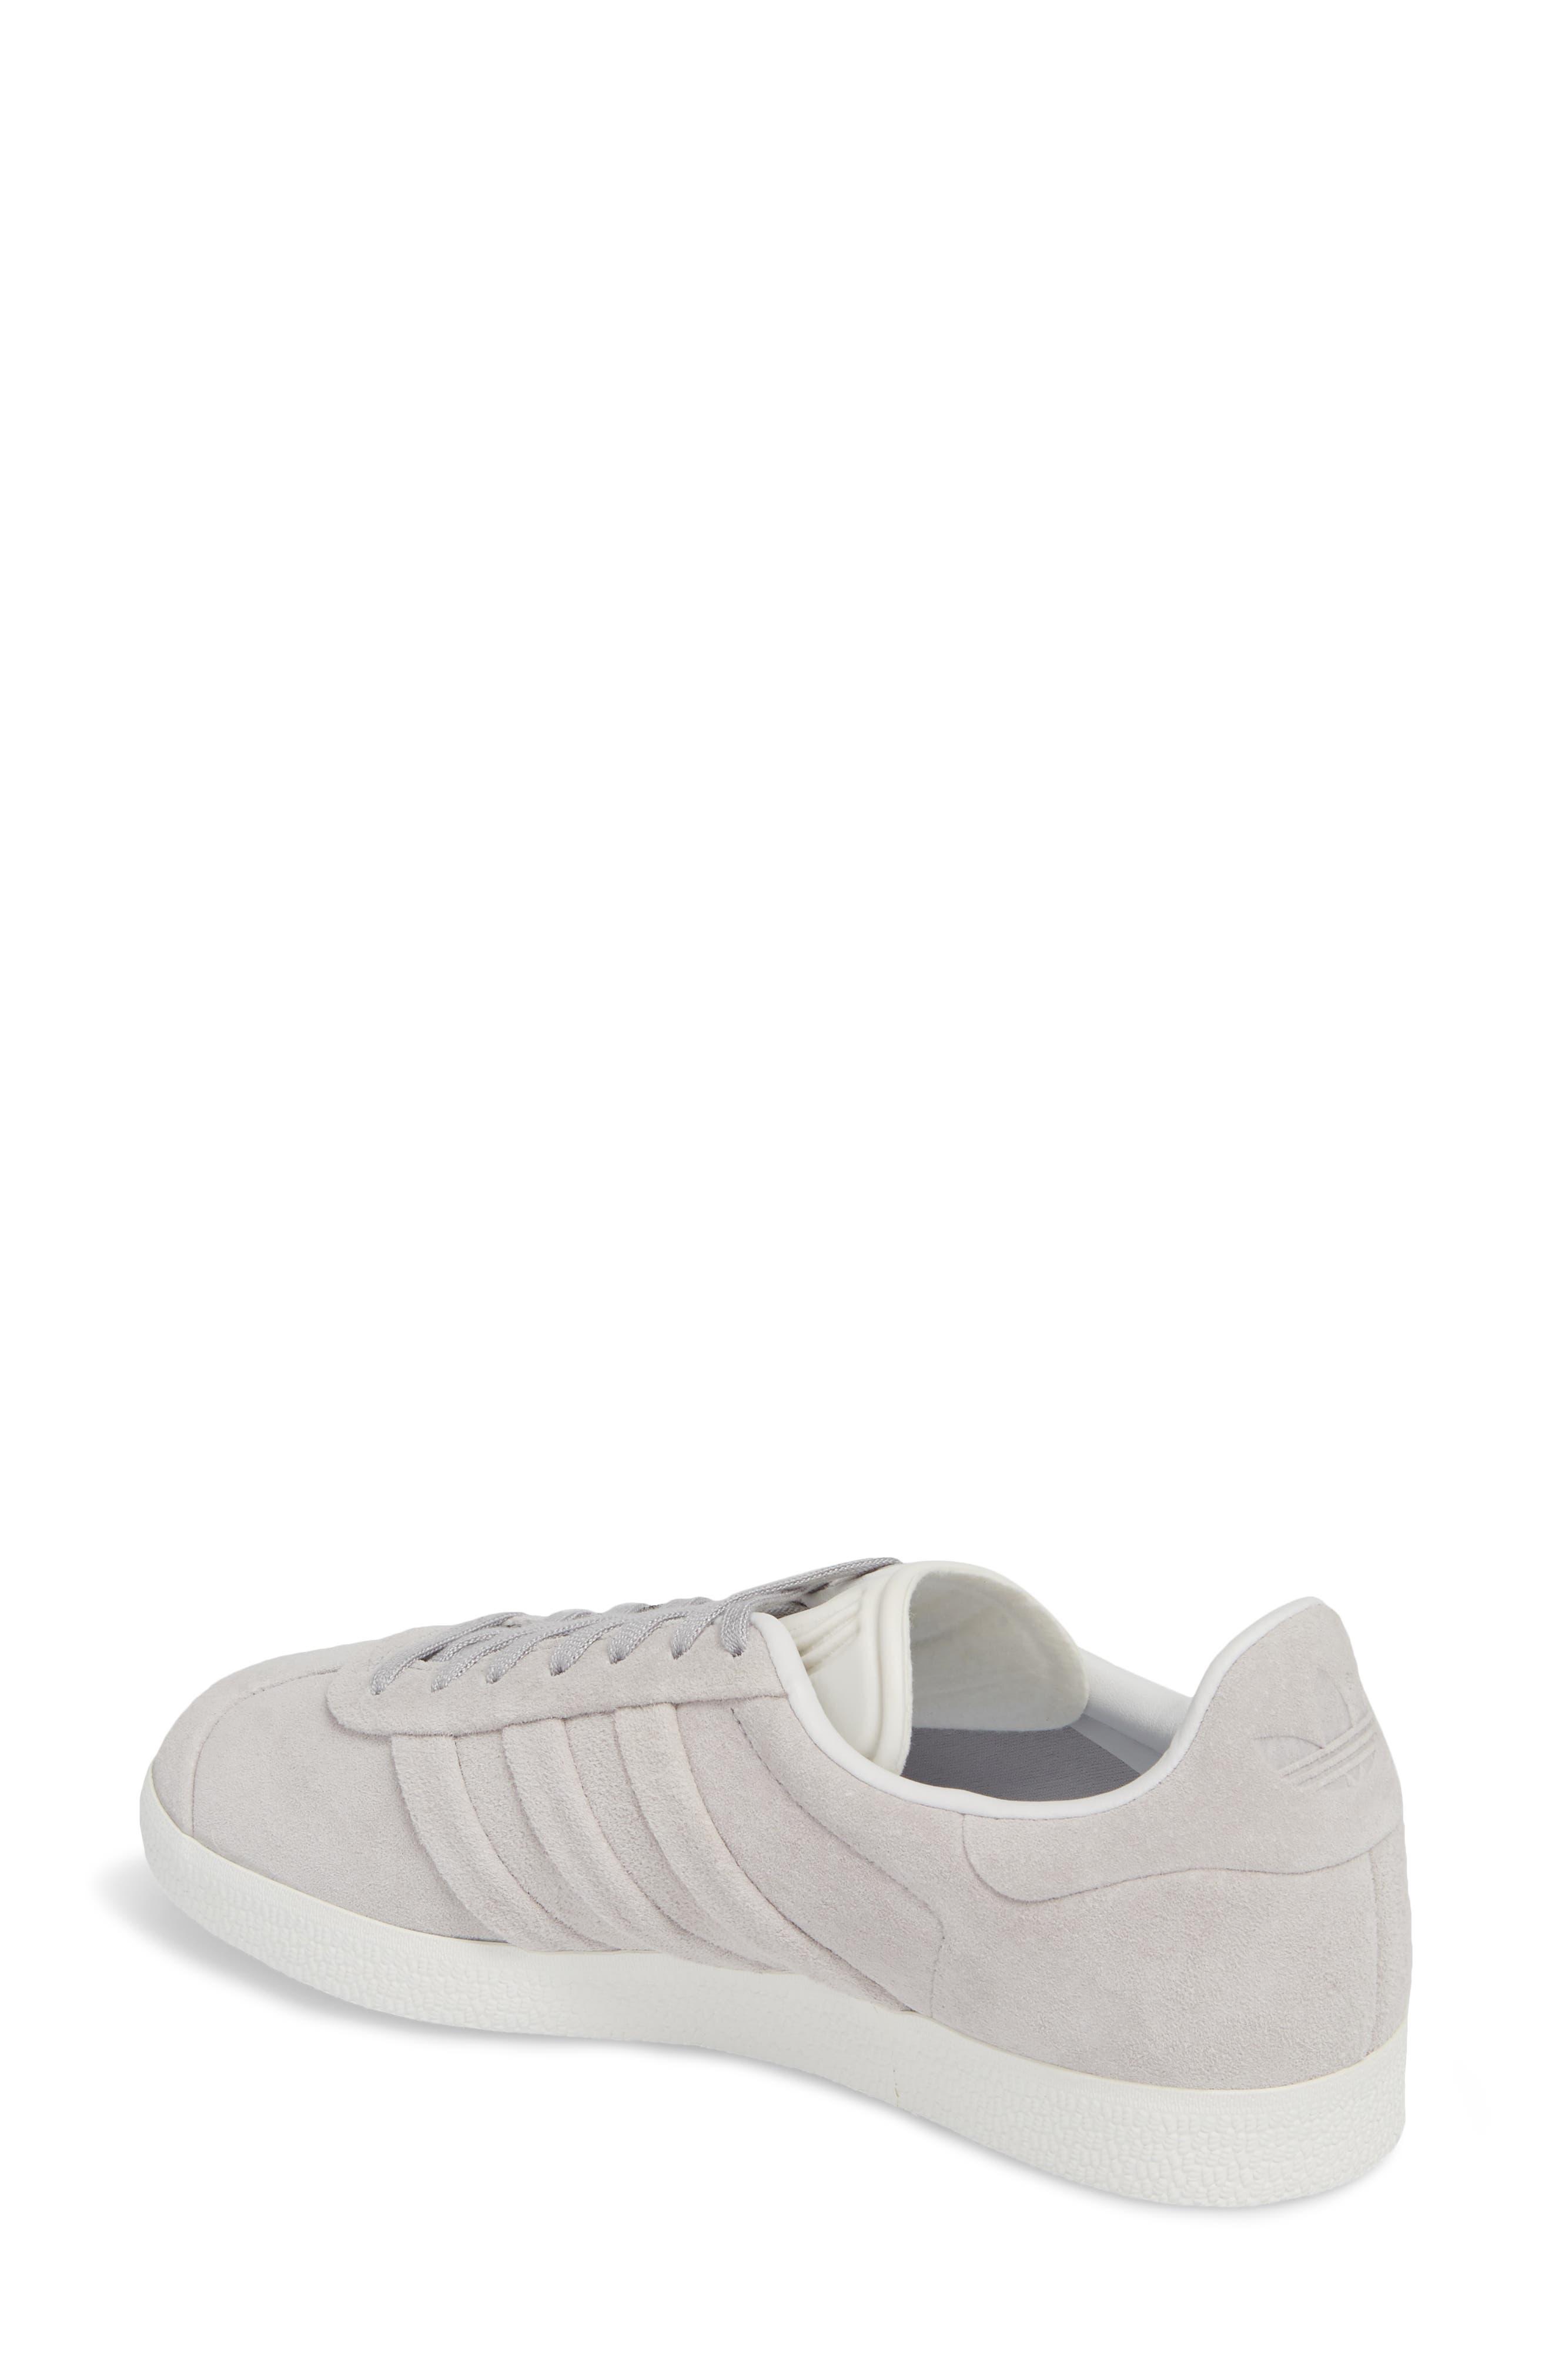 Gazelle Stitch & Turn Sneaker,                             Alternate thumbnail 2, color,                             GREY/ GREY/ WHITE